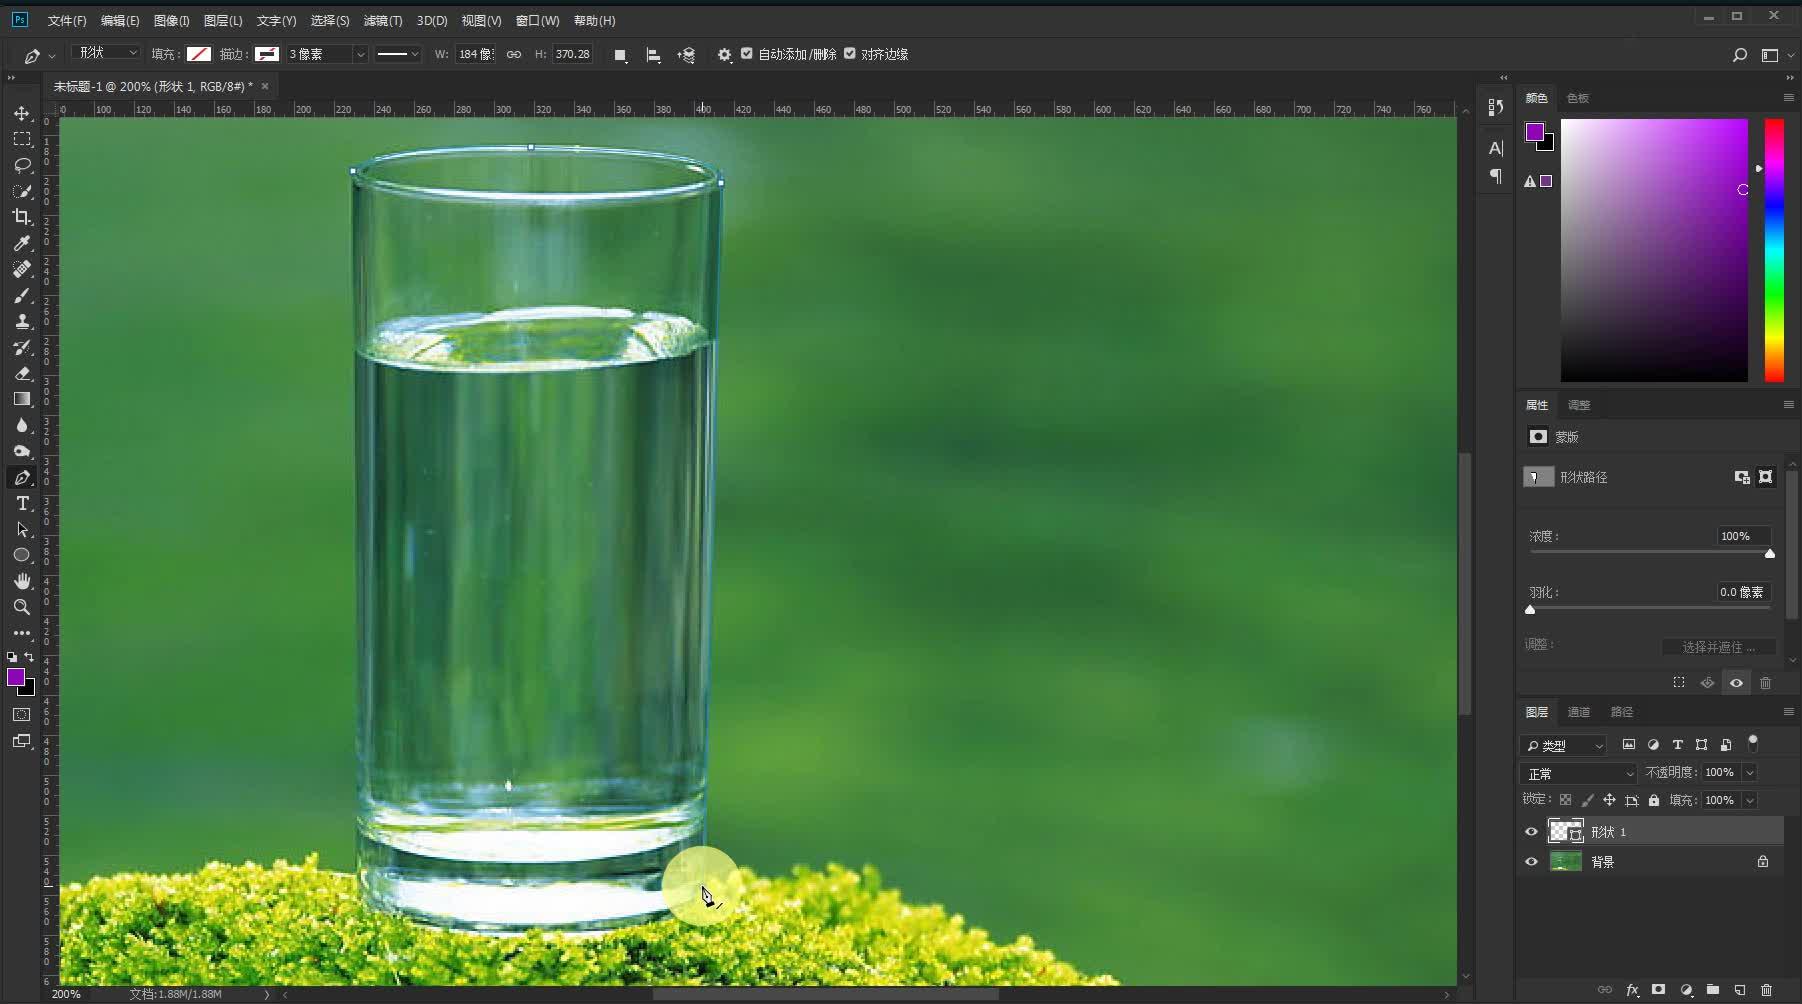 ps教程复杂背景抠图透明玻璃杯子-ps淘宝美工产品篇-淘宝美工.